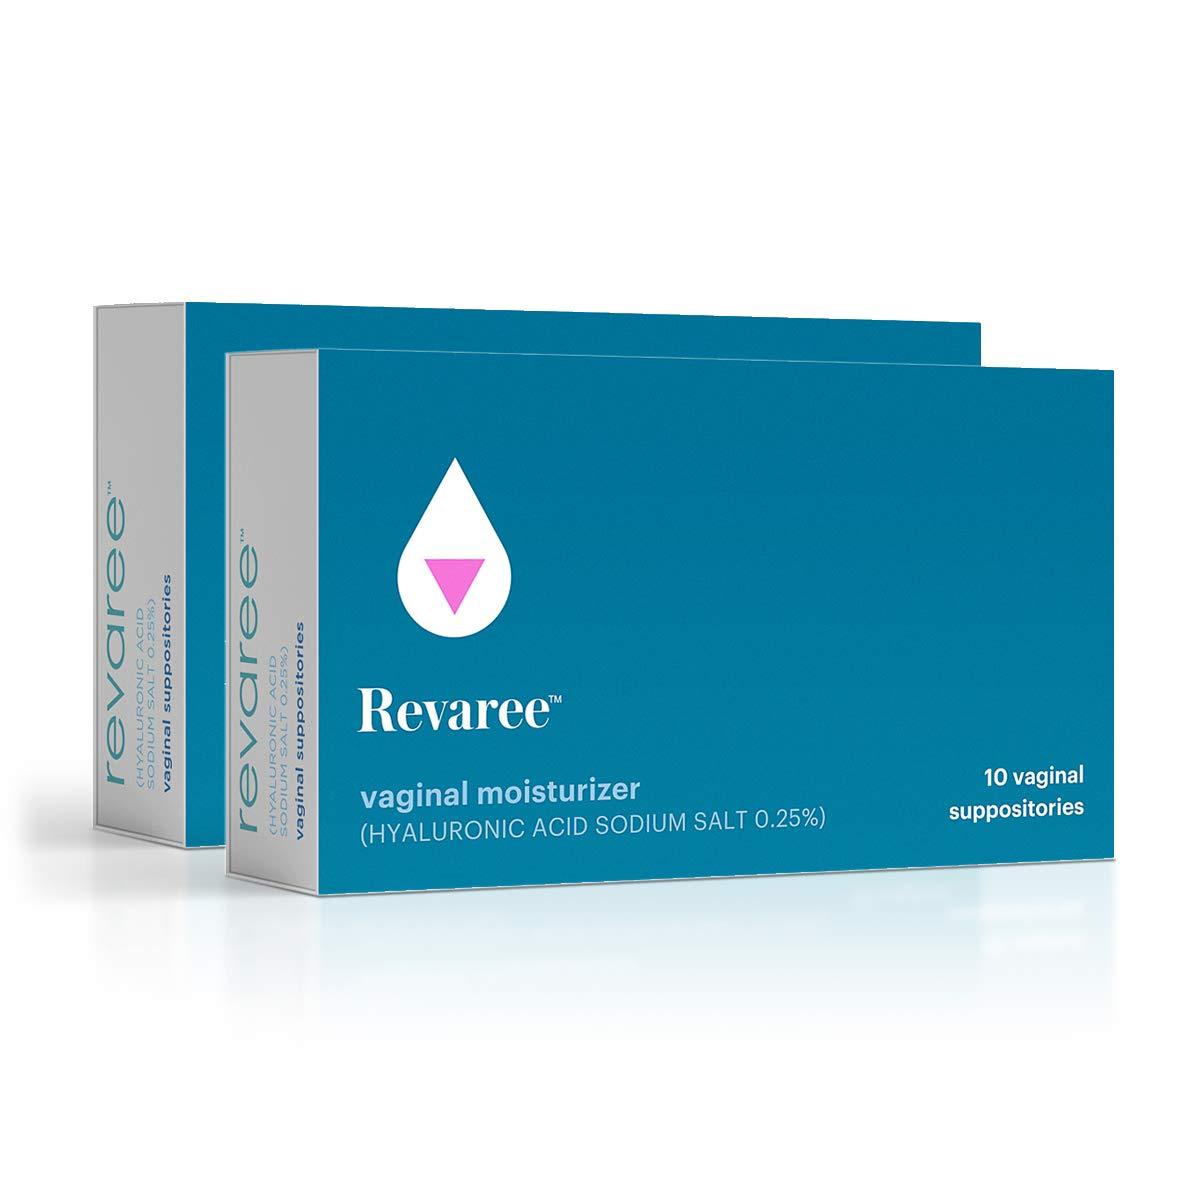 Bonafide – Revaree Hyaluronic Acid for Vaginal Dryness – Non-Hormonal, Paraben-Free (20 Vaginal Inserts)